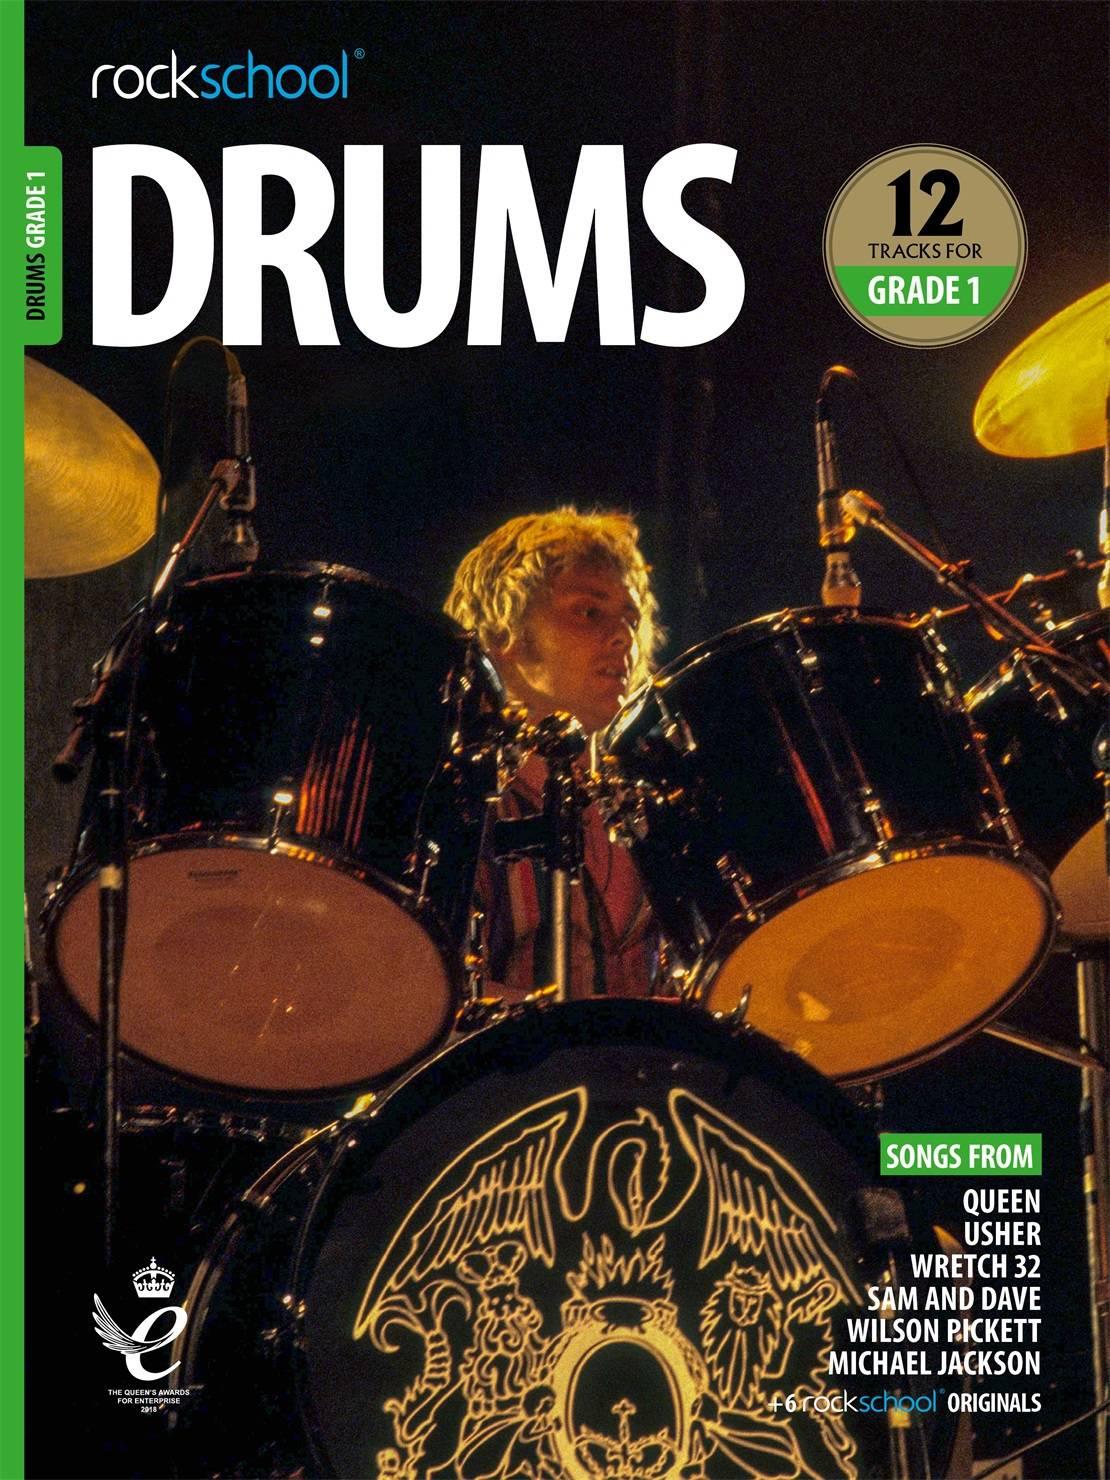 Rockschool - Shop - Drums Grade 1 | RSL